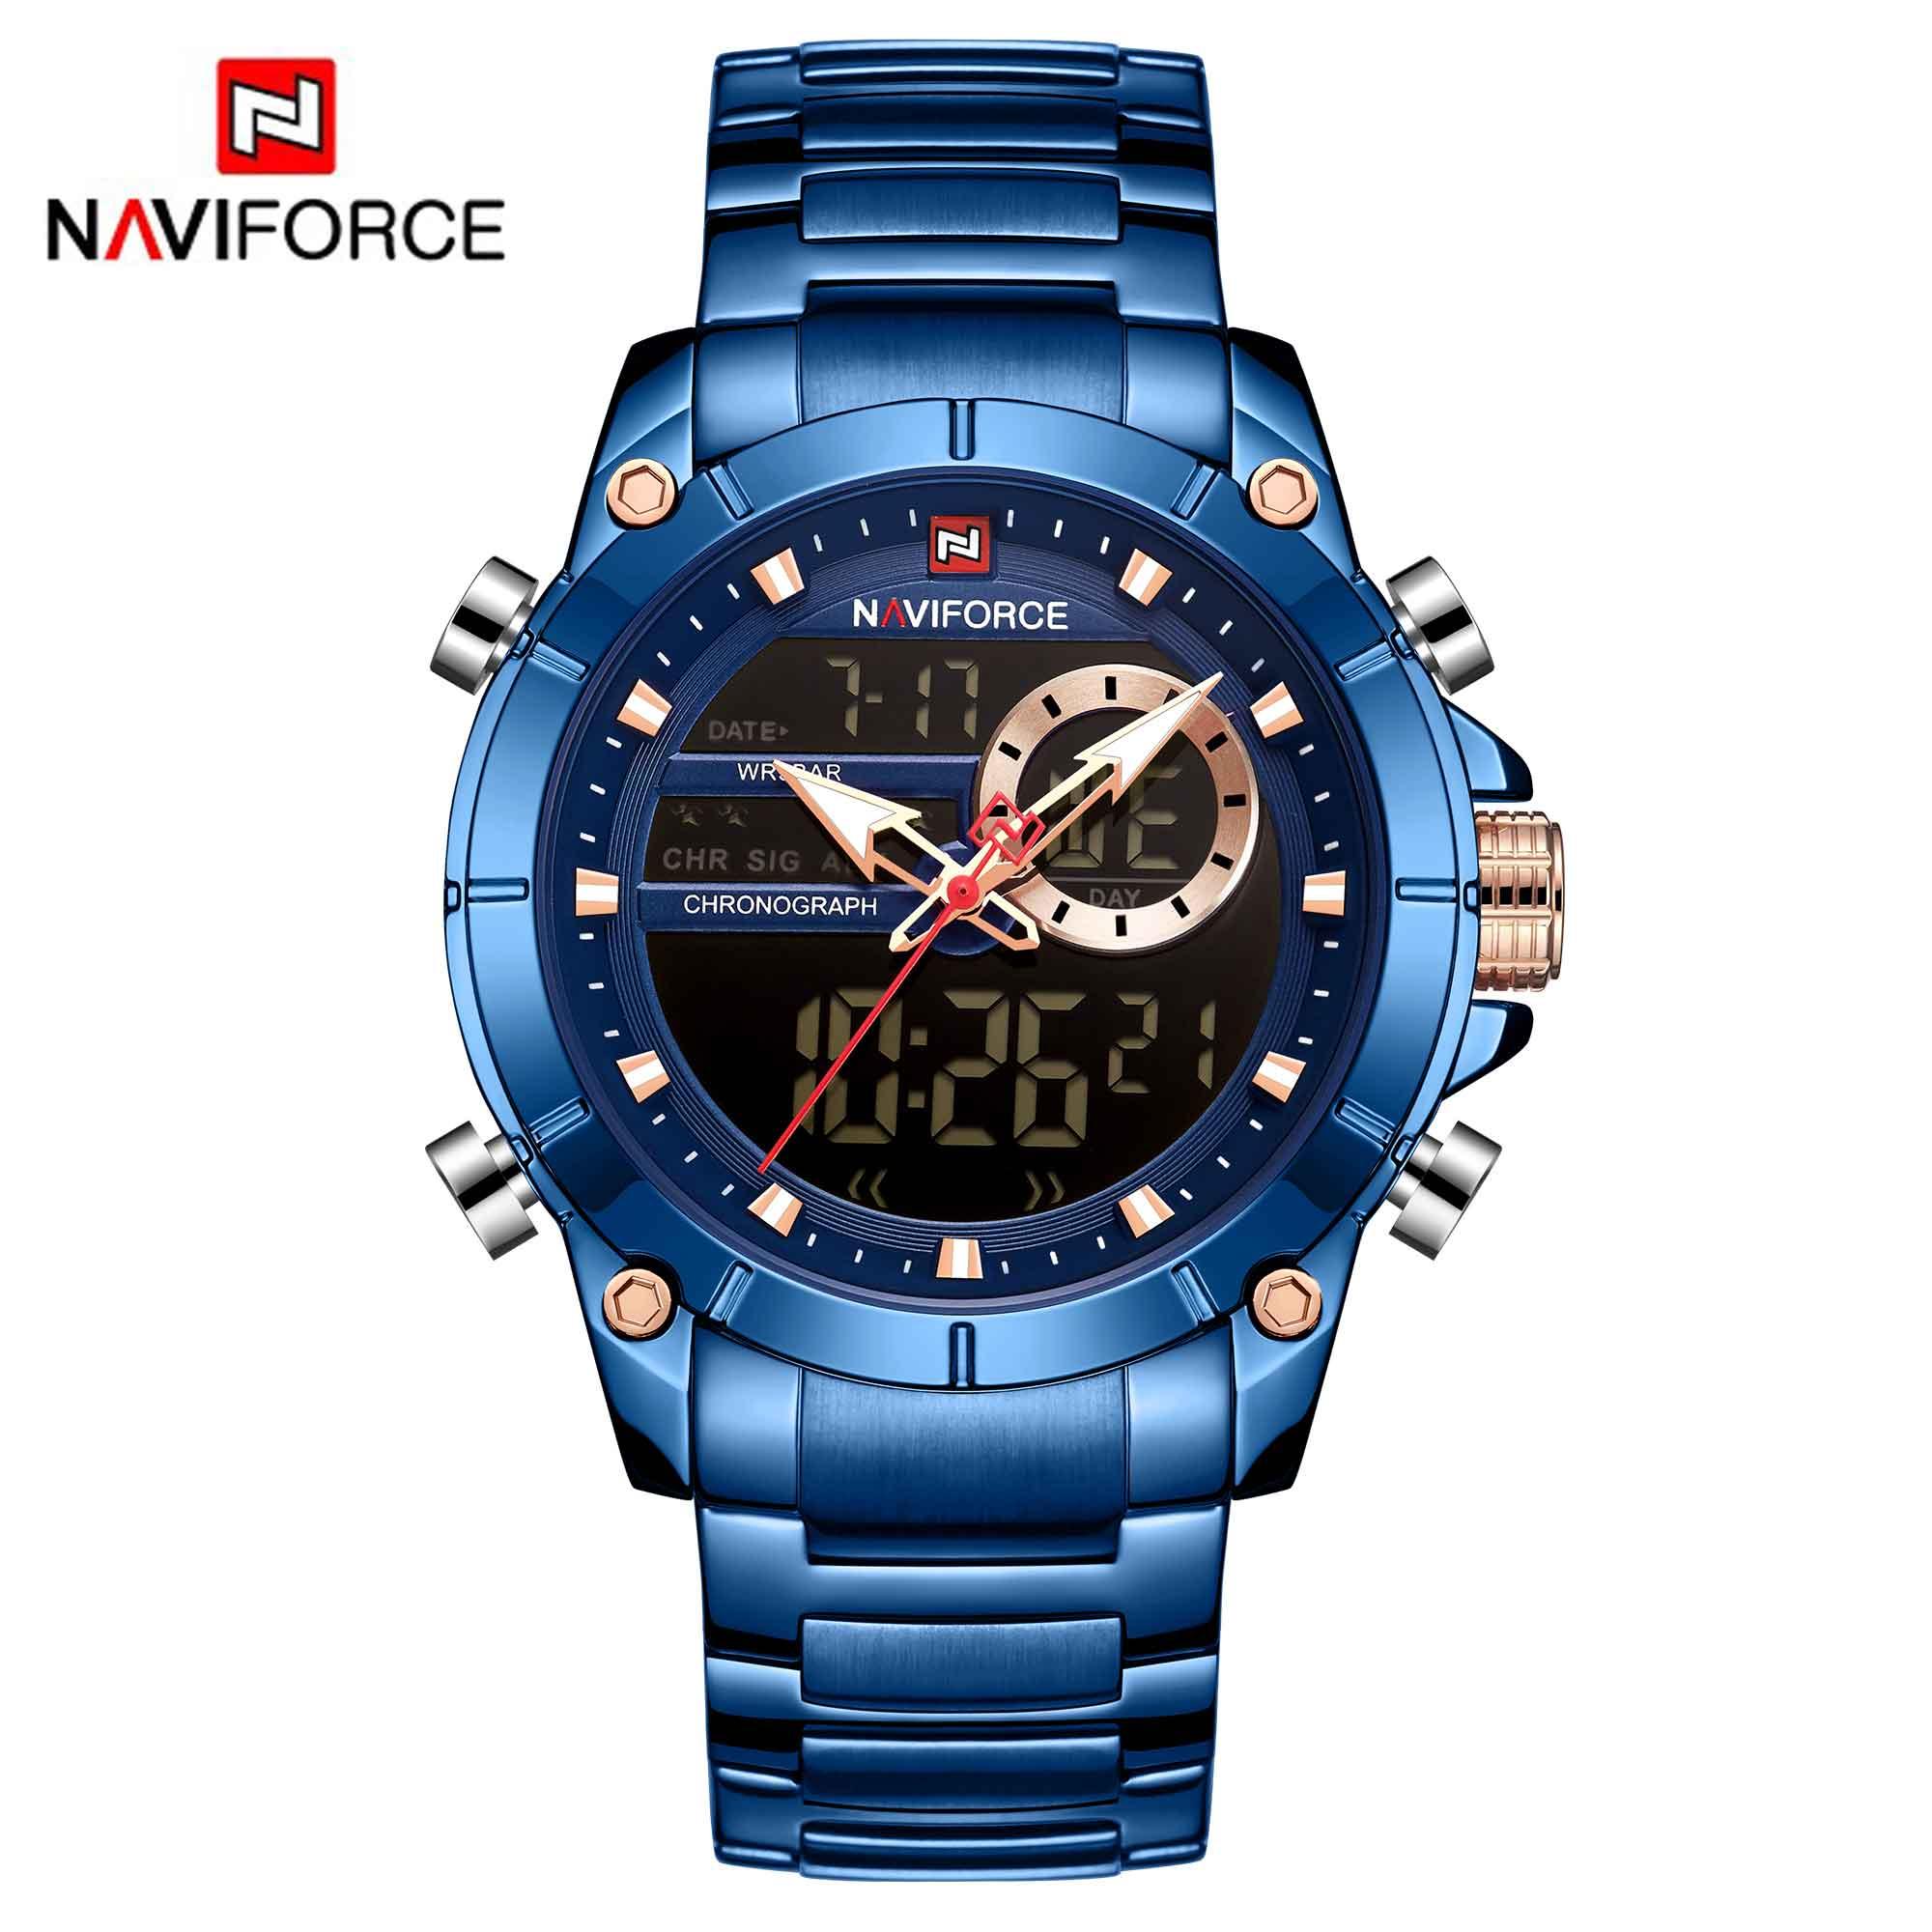 NAVIFORCE Hot Men Watches Fashion Casual Bussiness Quartz Watch Men Military Chronograph Stainless Steel Wristwatch Reloj Hombre 6